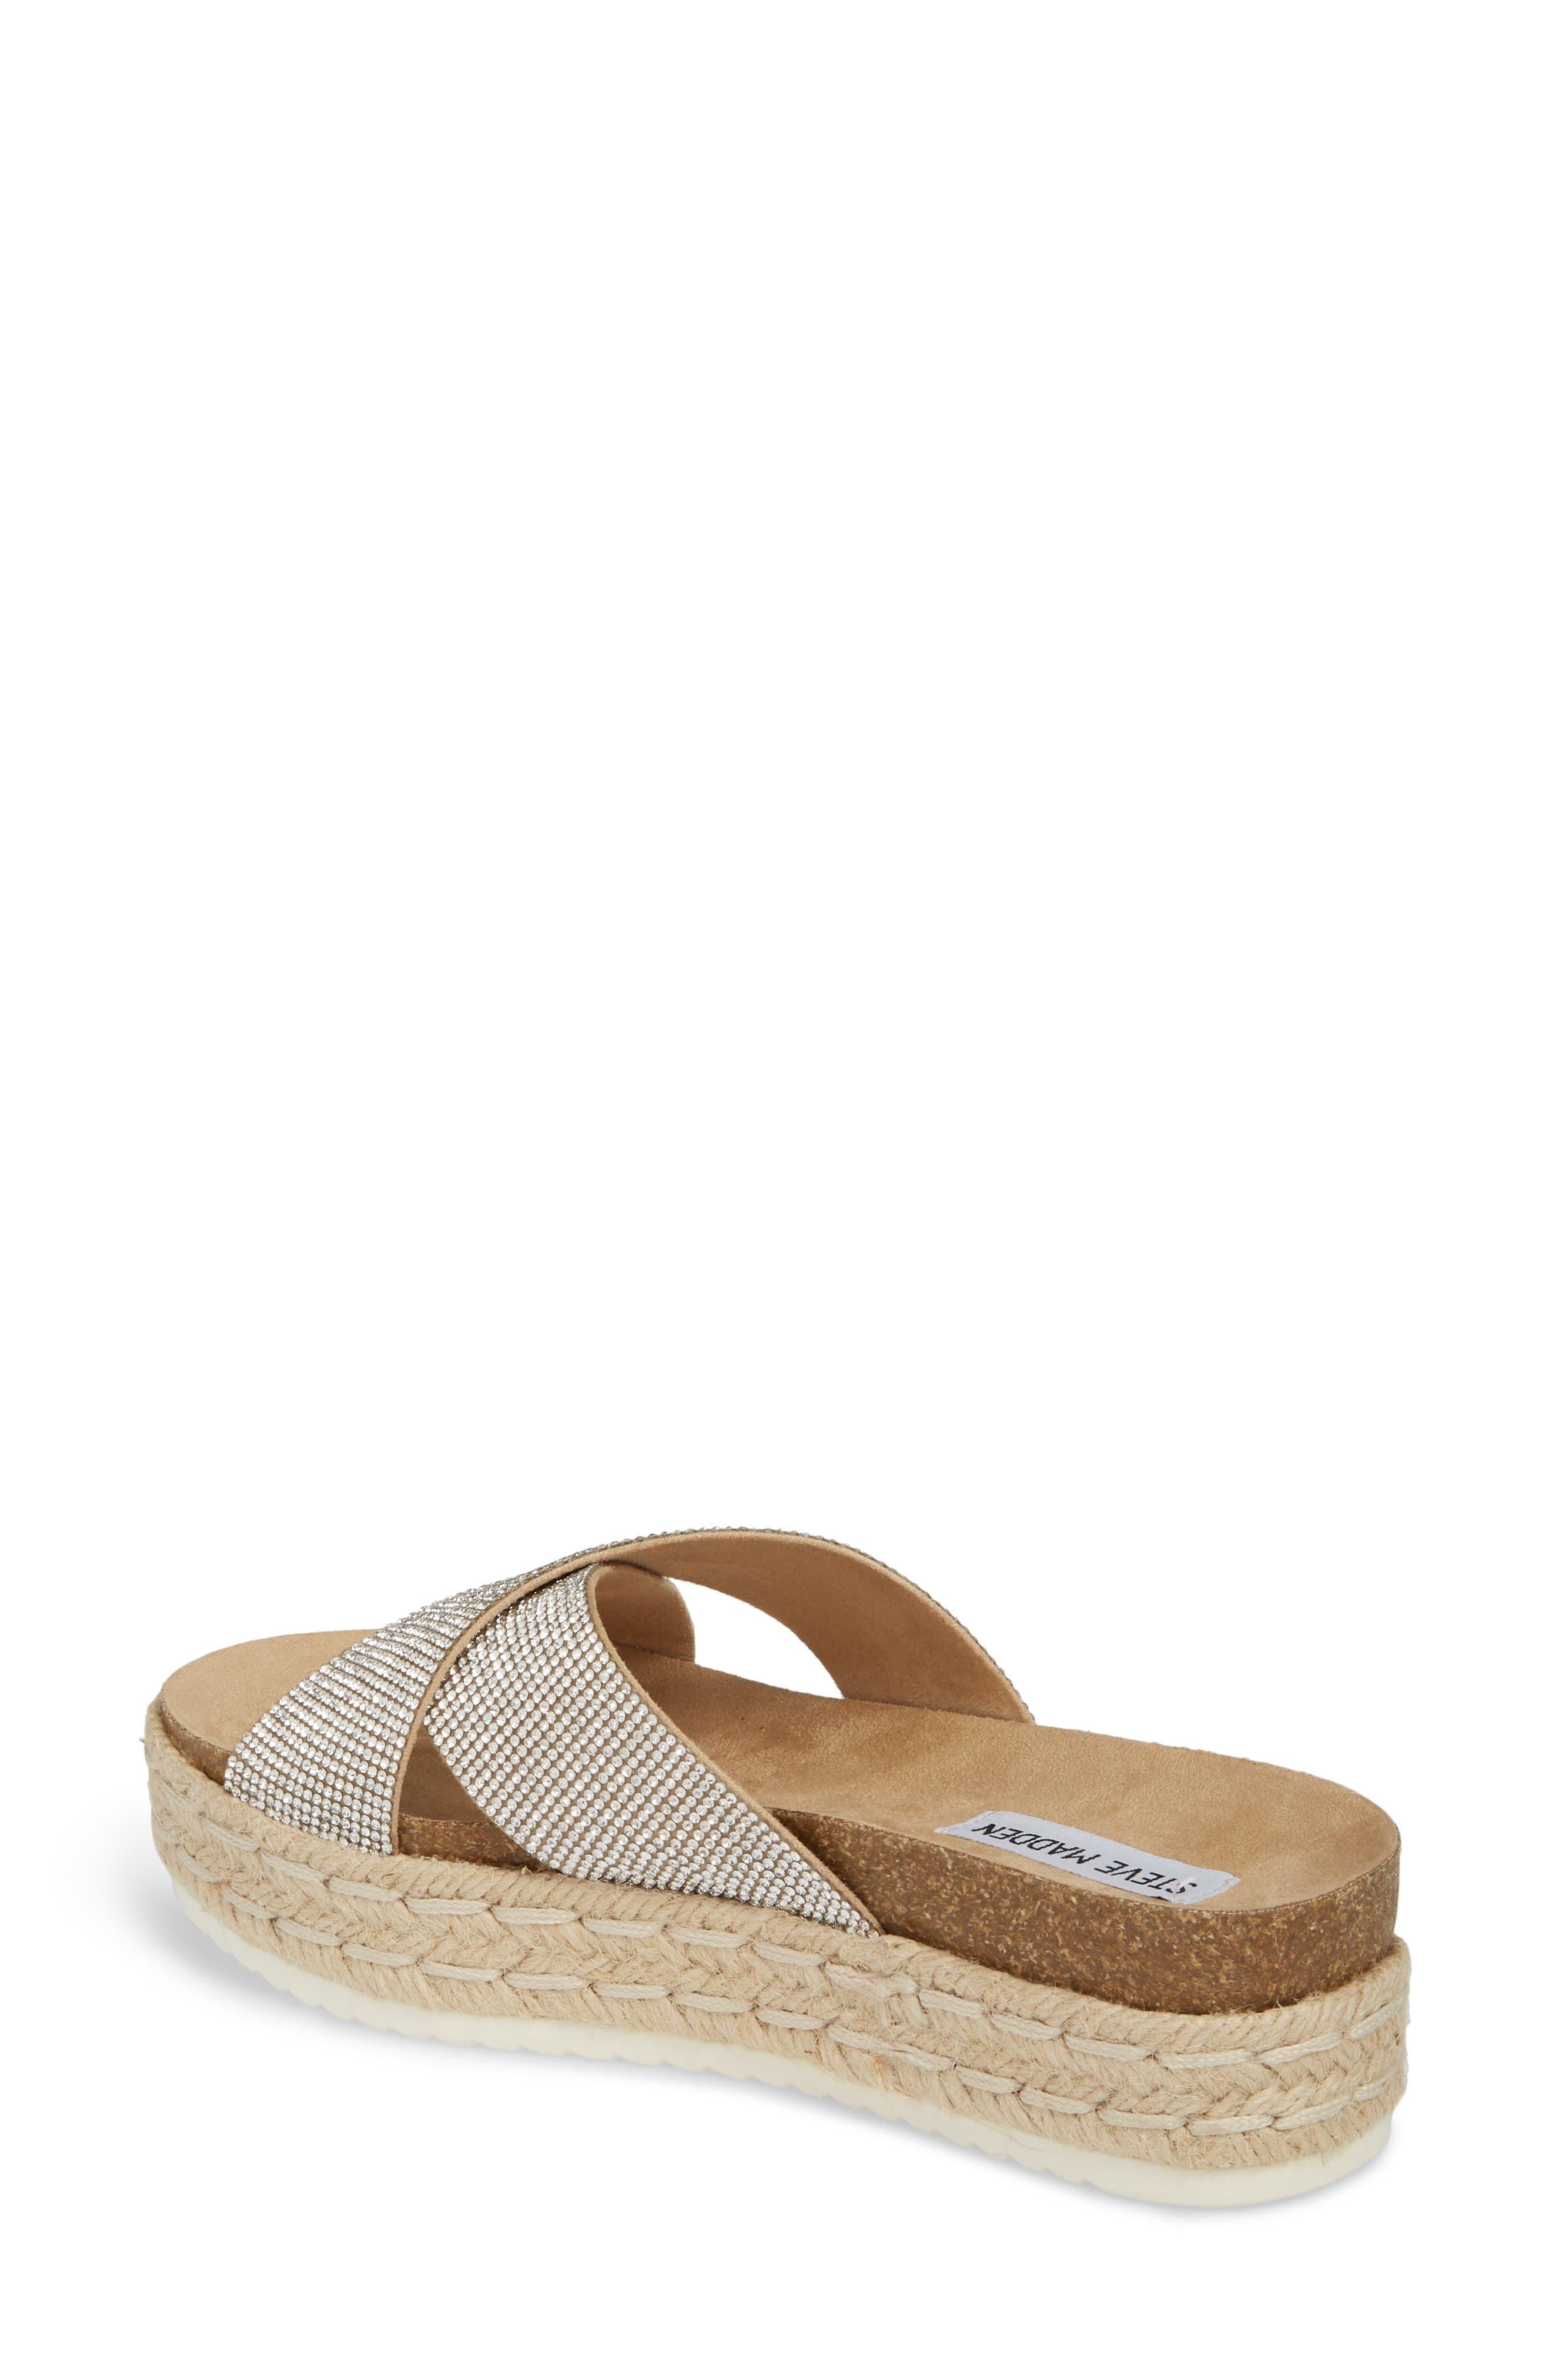 Arran-R Platform Espadrille Sandal,                             Alternate thumbnail 2, color,                             Silver